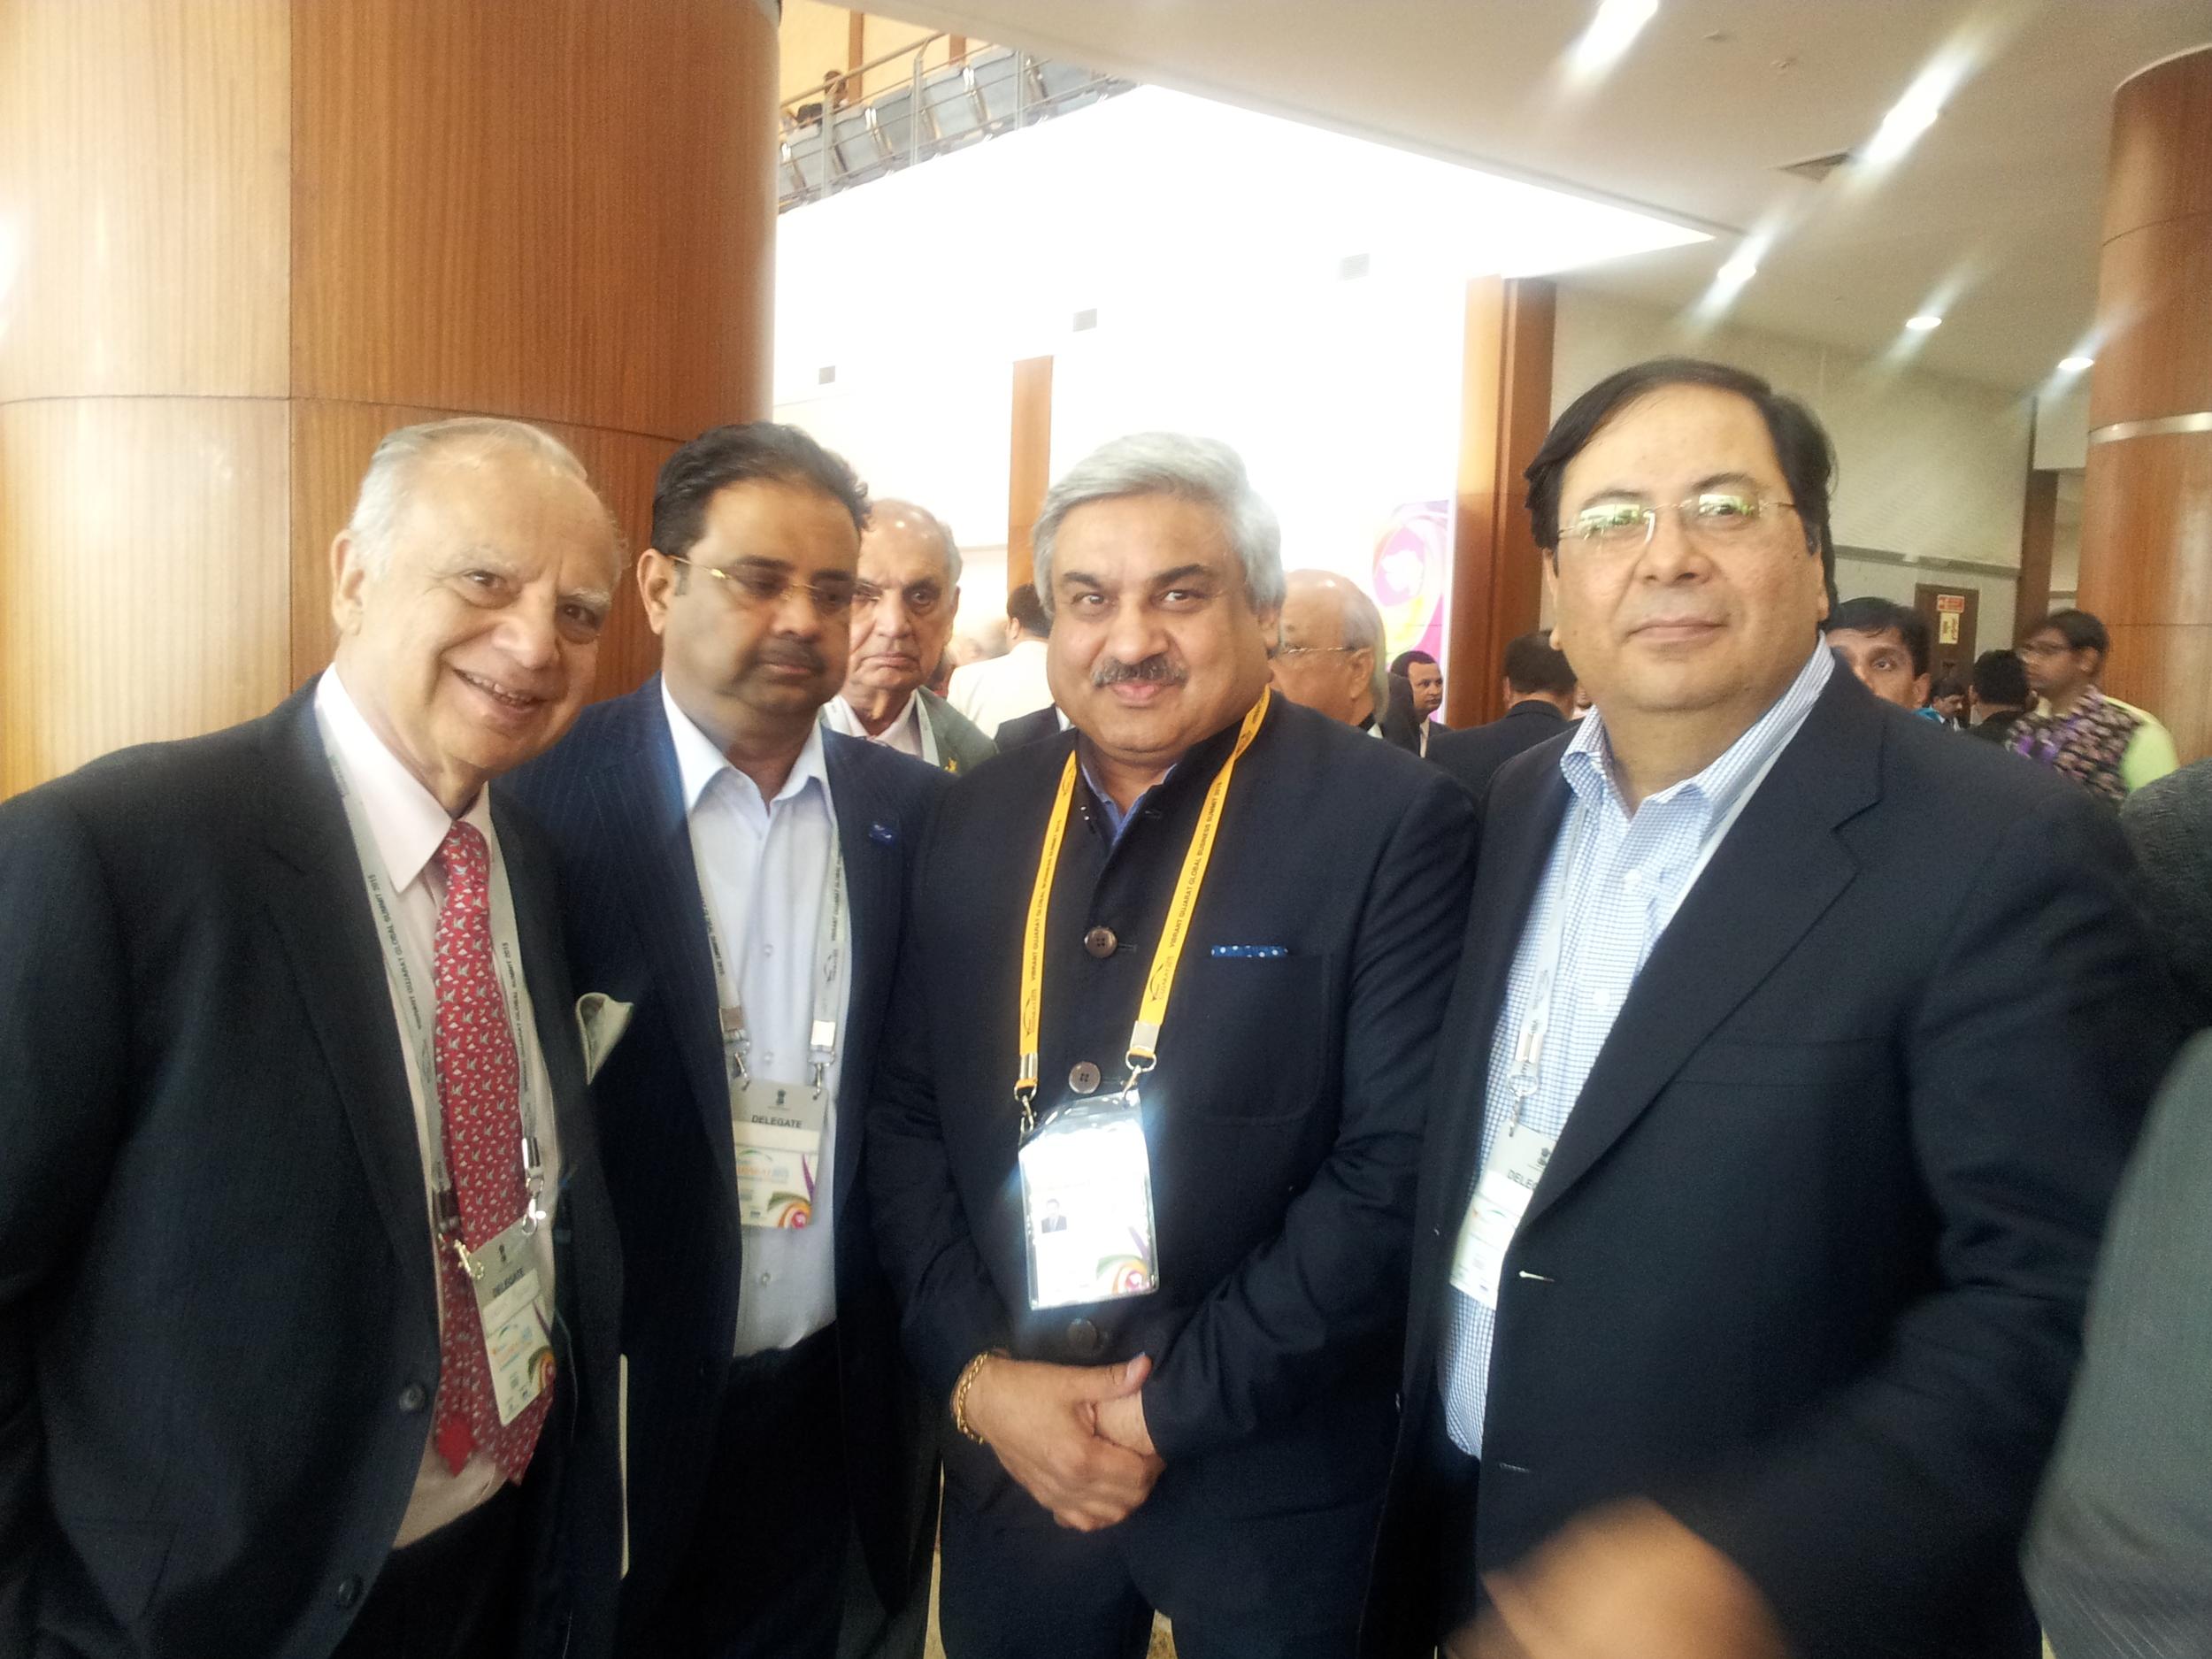 In Photos (Right to Left):Suresh Nichani, Vice Chairman of RootCorp with Ambassador Wadhwa, Mr. Danny Gaekwad & Mr. Sunder Advani.